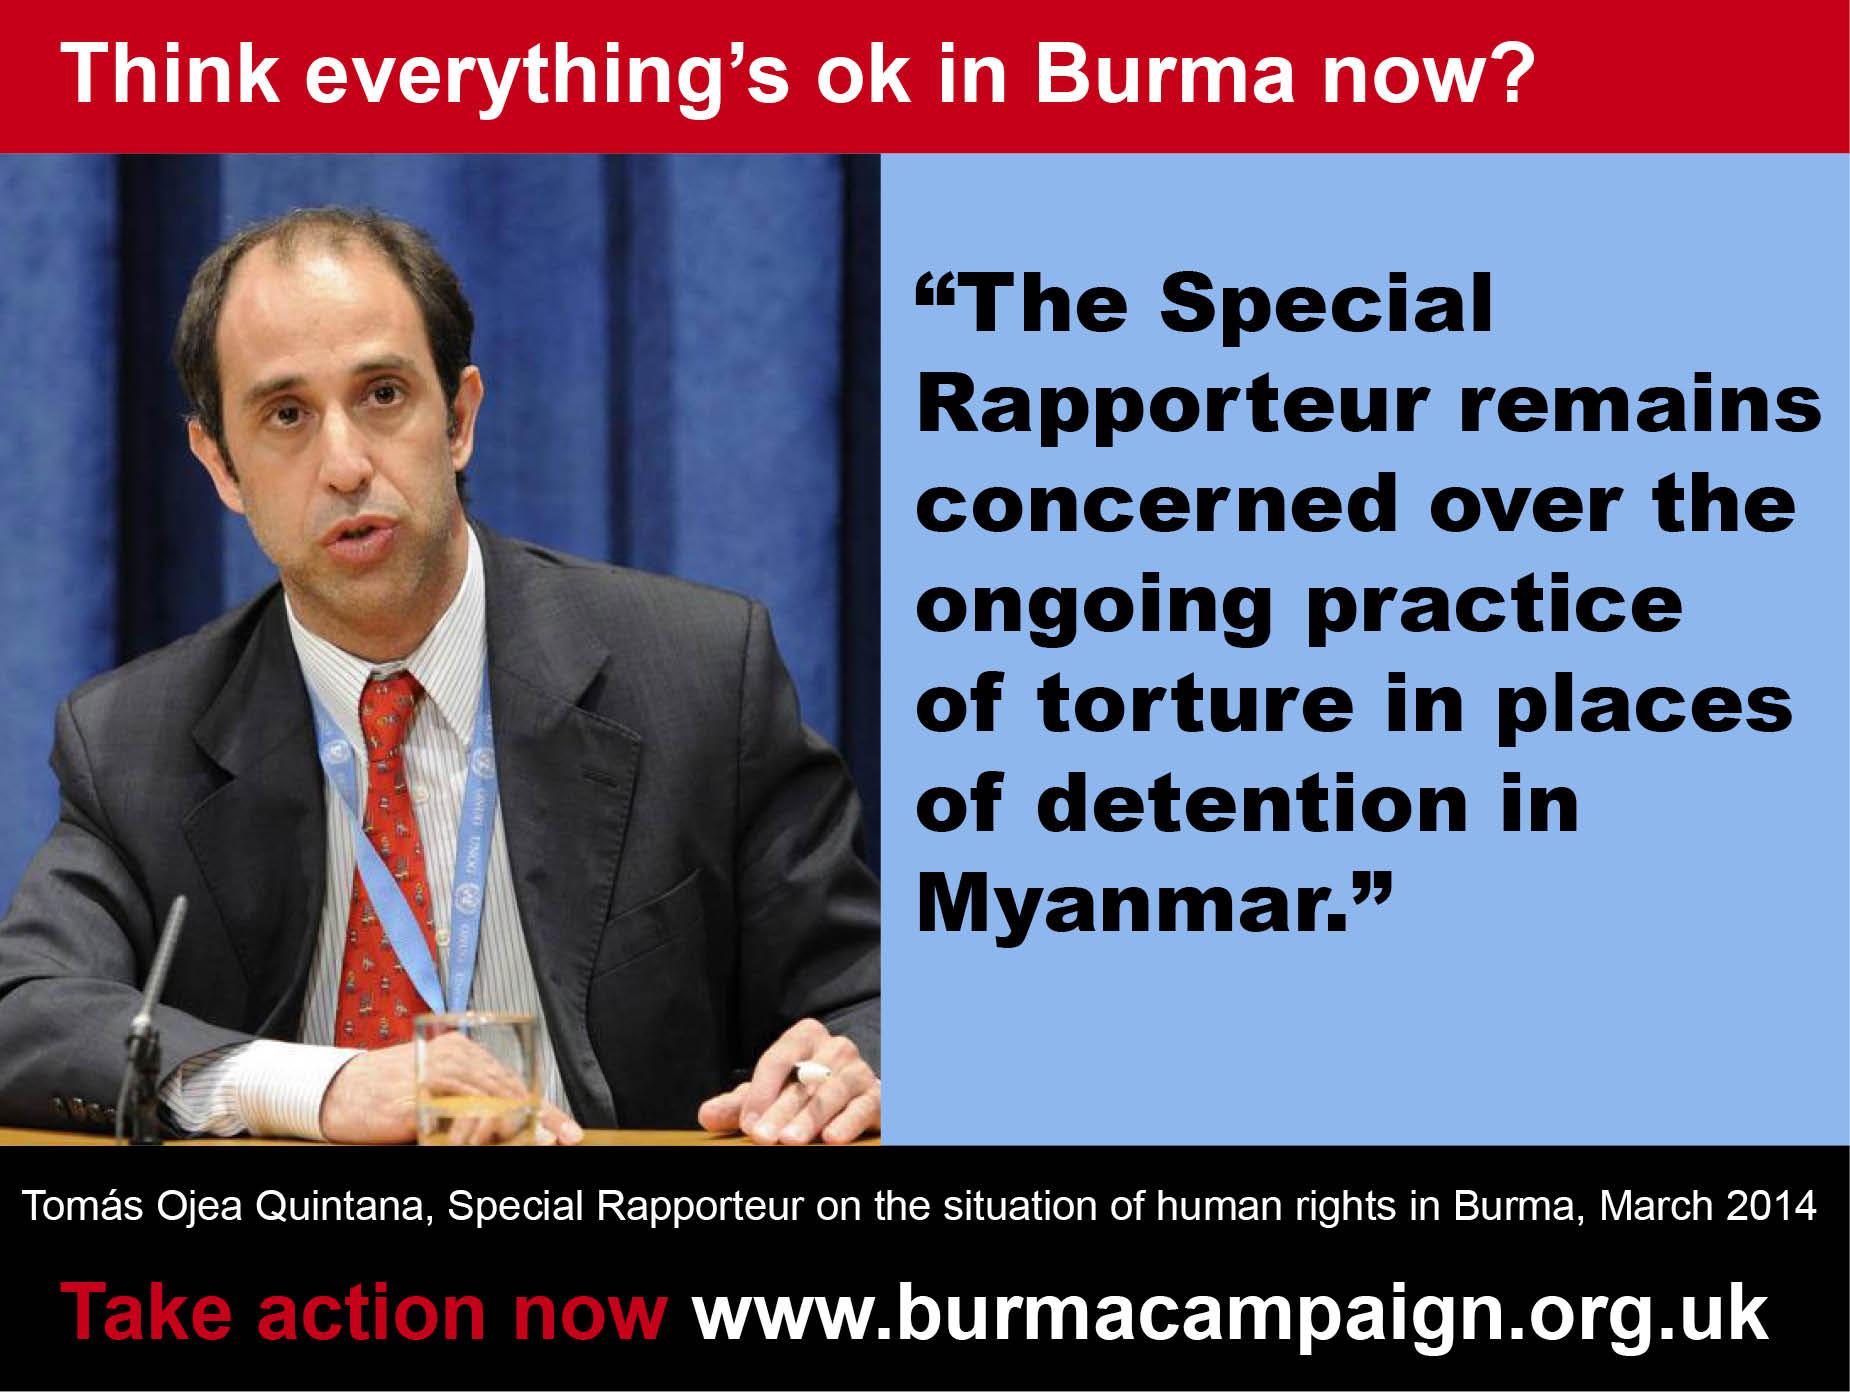 11 think everything ok quintana un report 2014 torture burma campaign UK